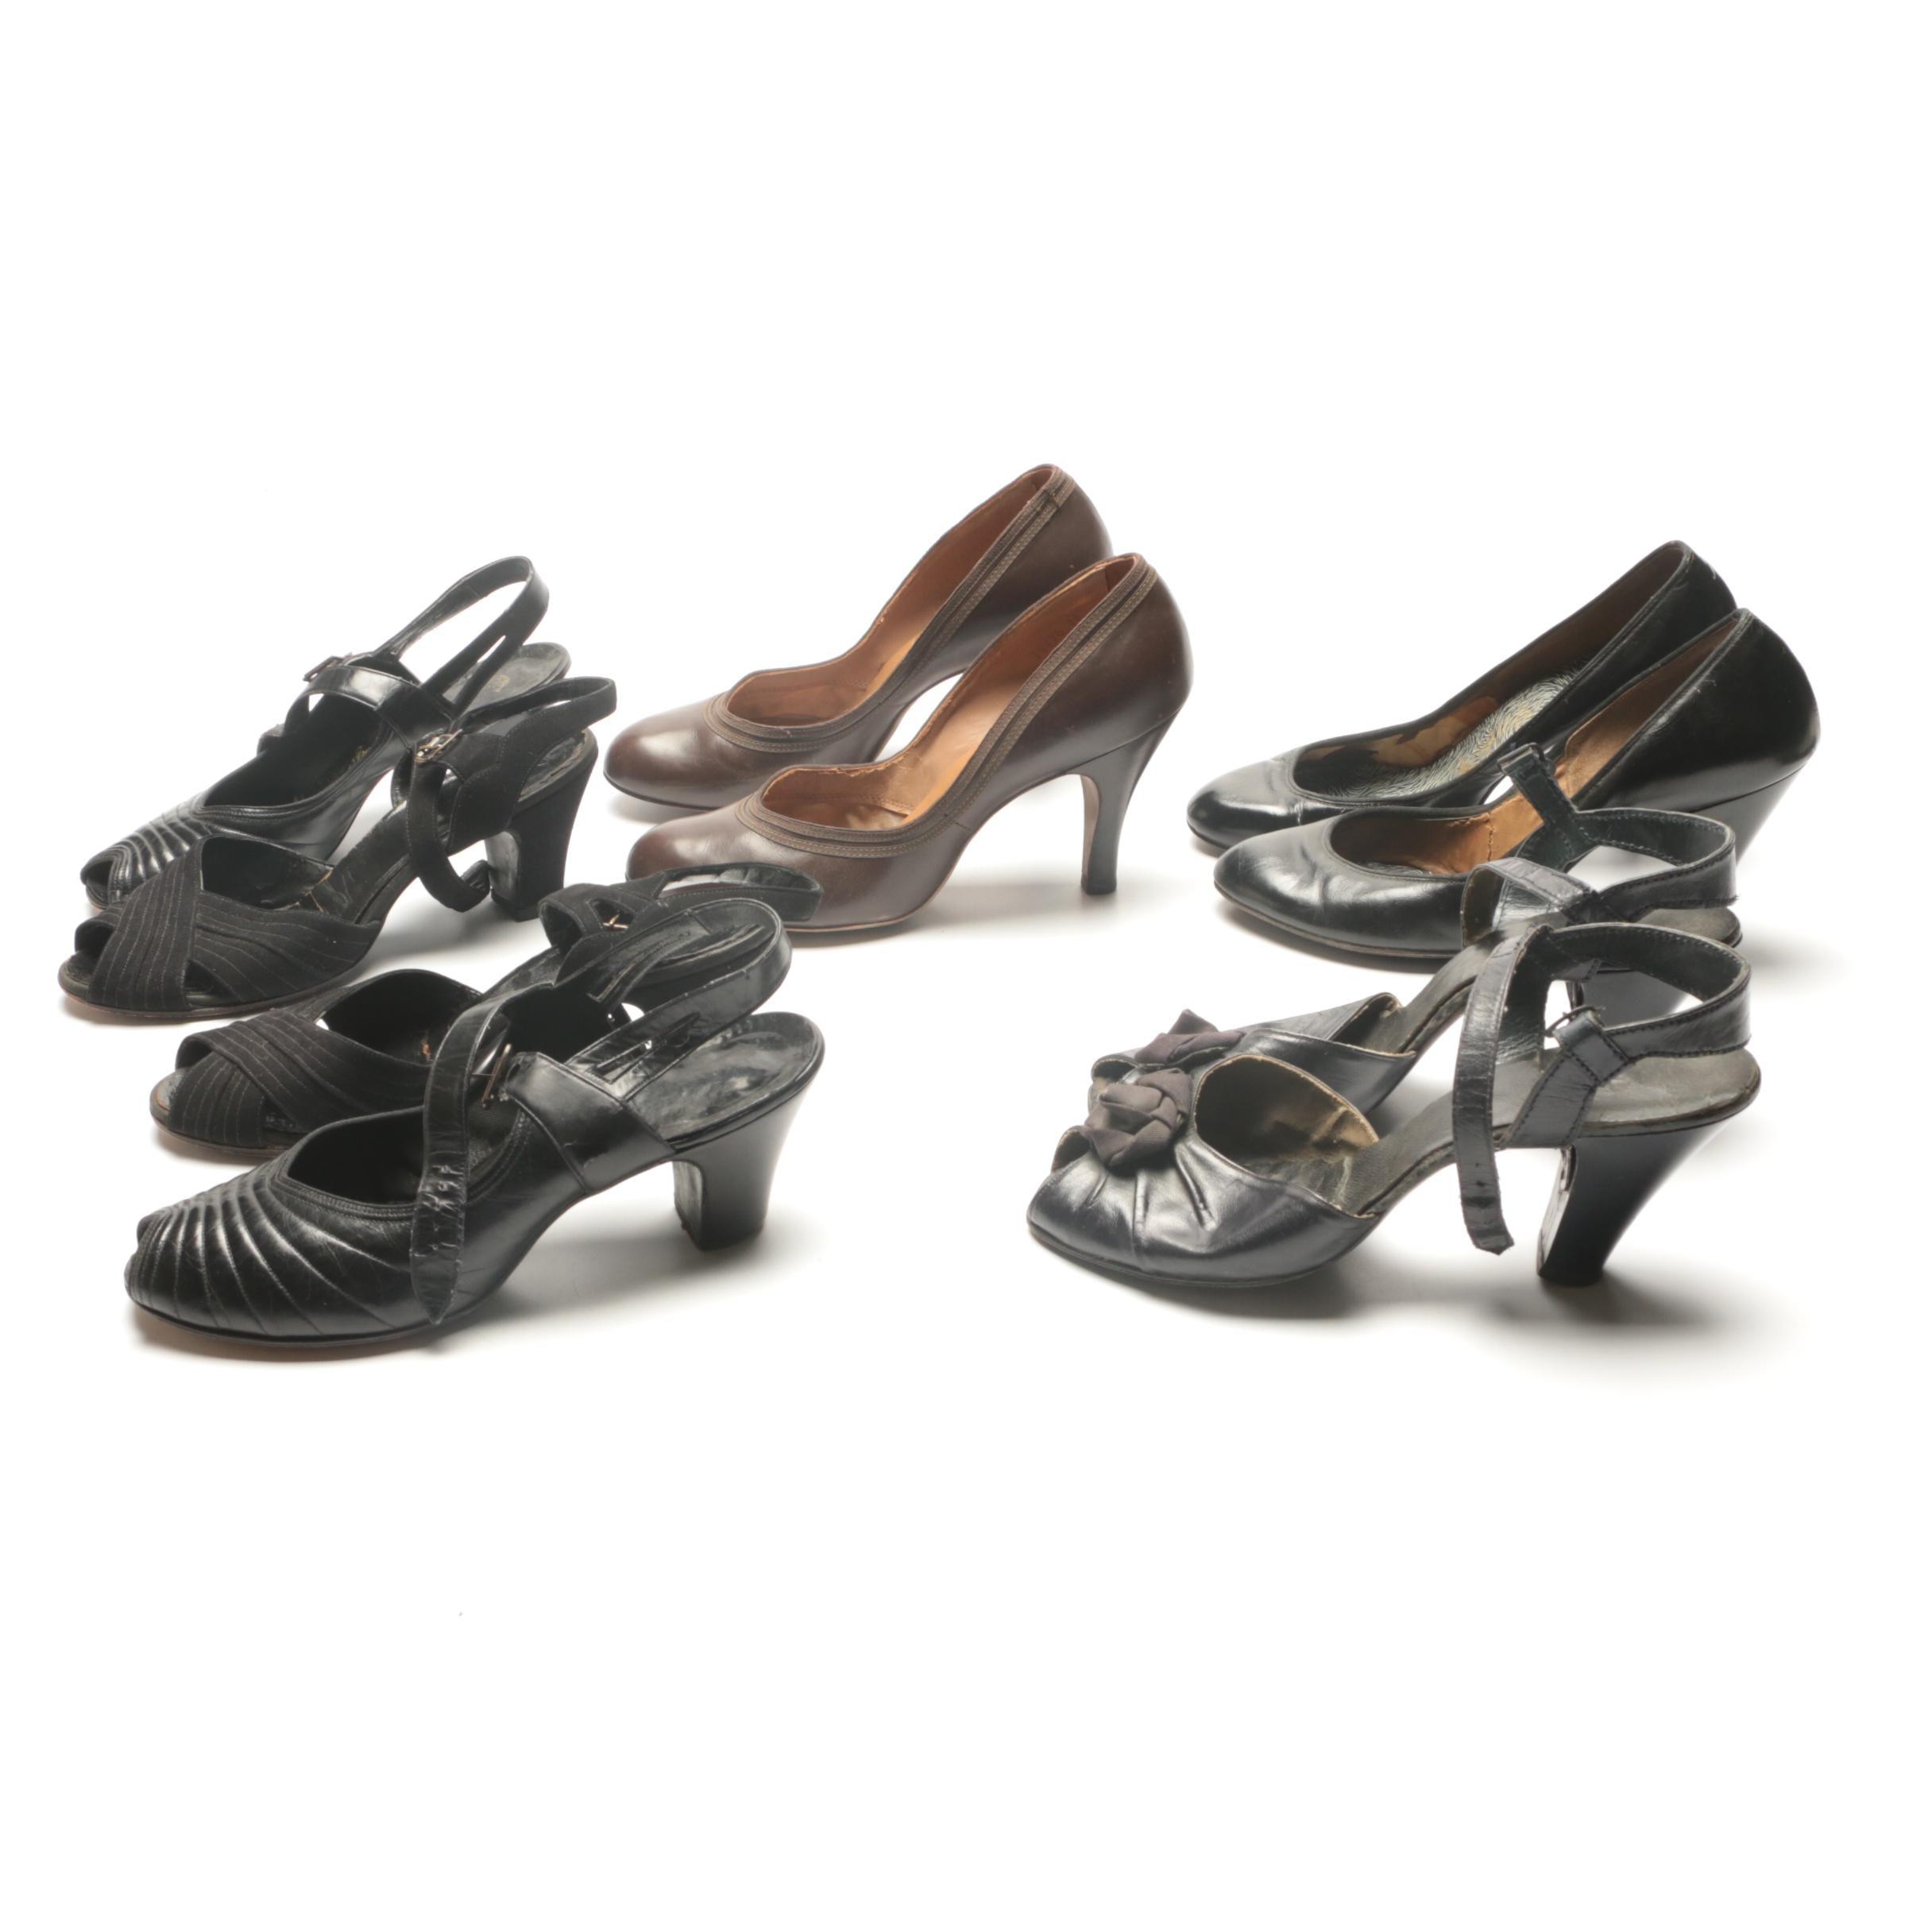 Circa 1940s High Heels Including Grace Walker and Romney